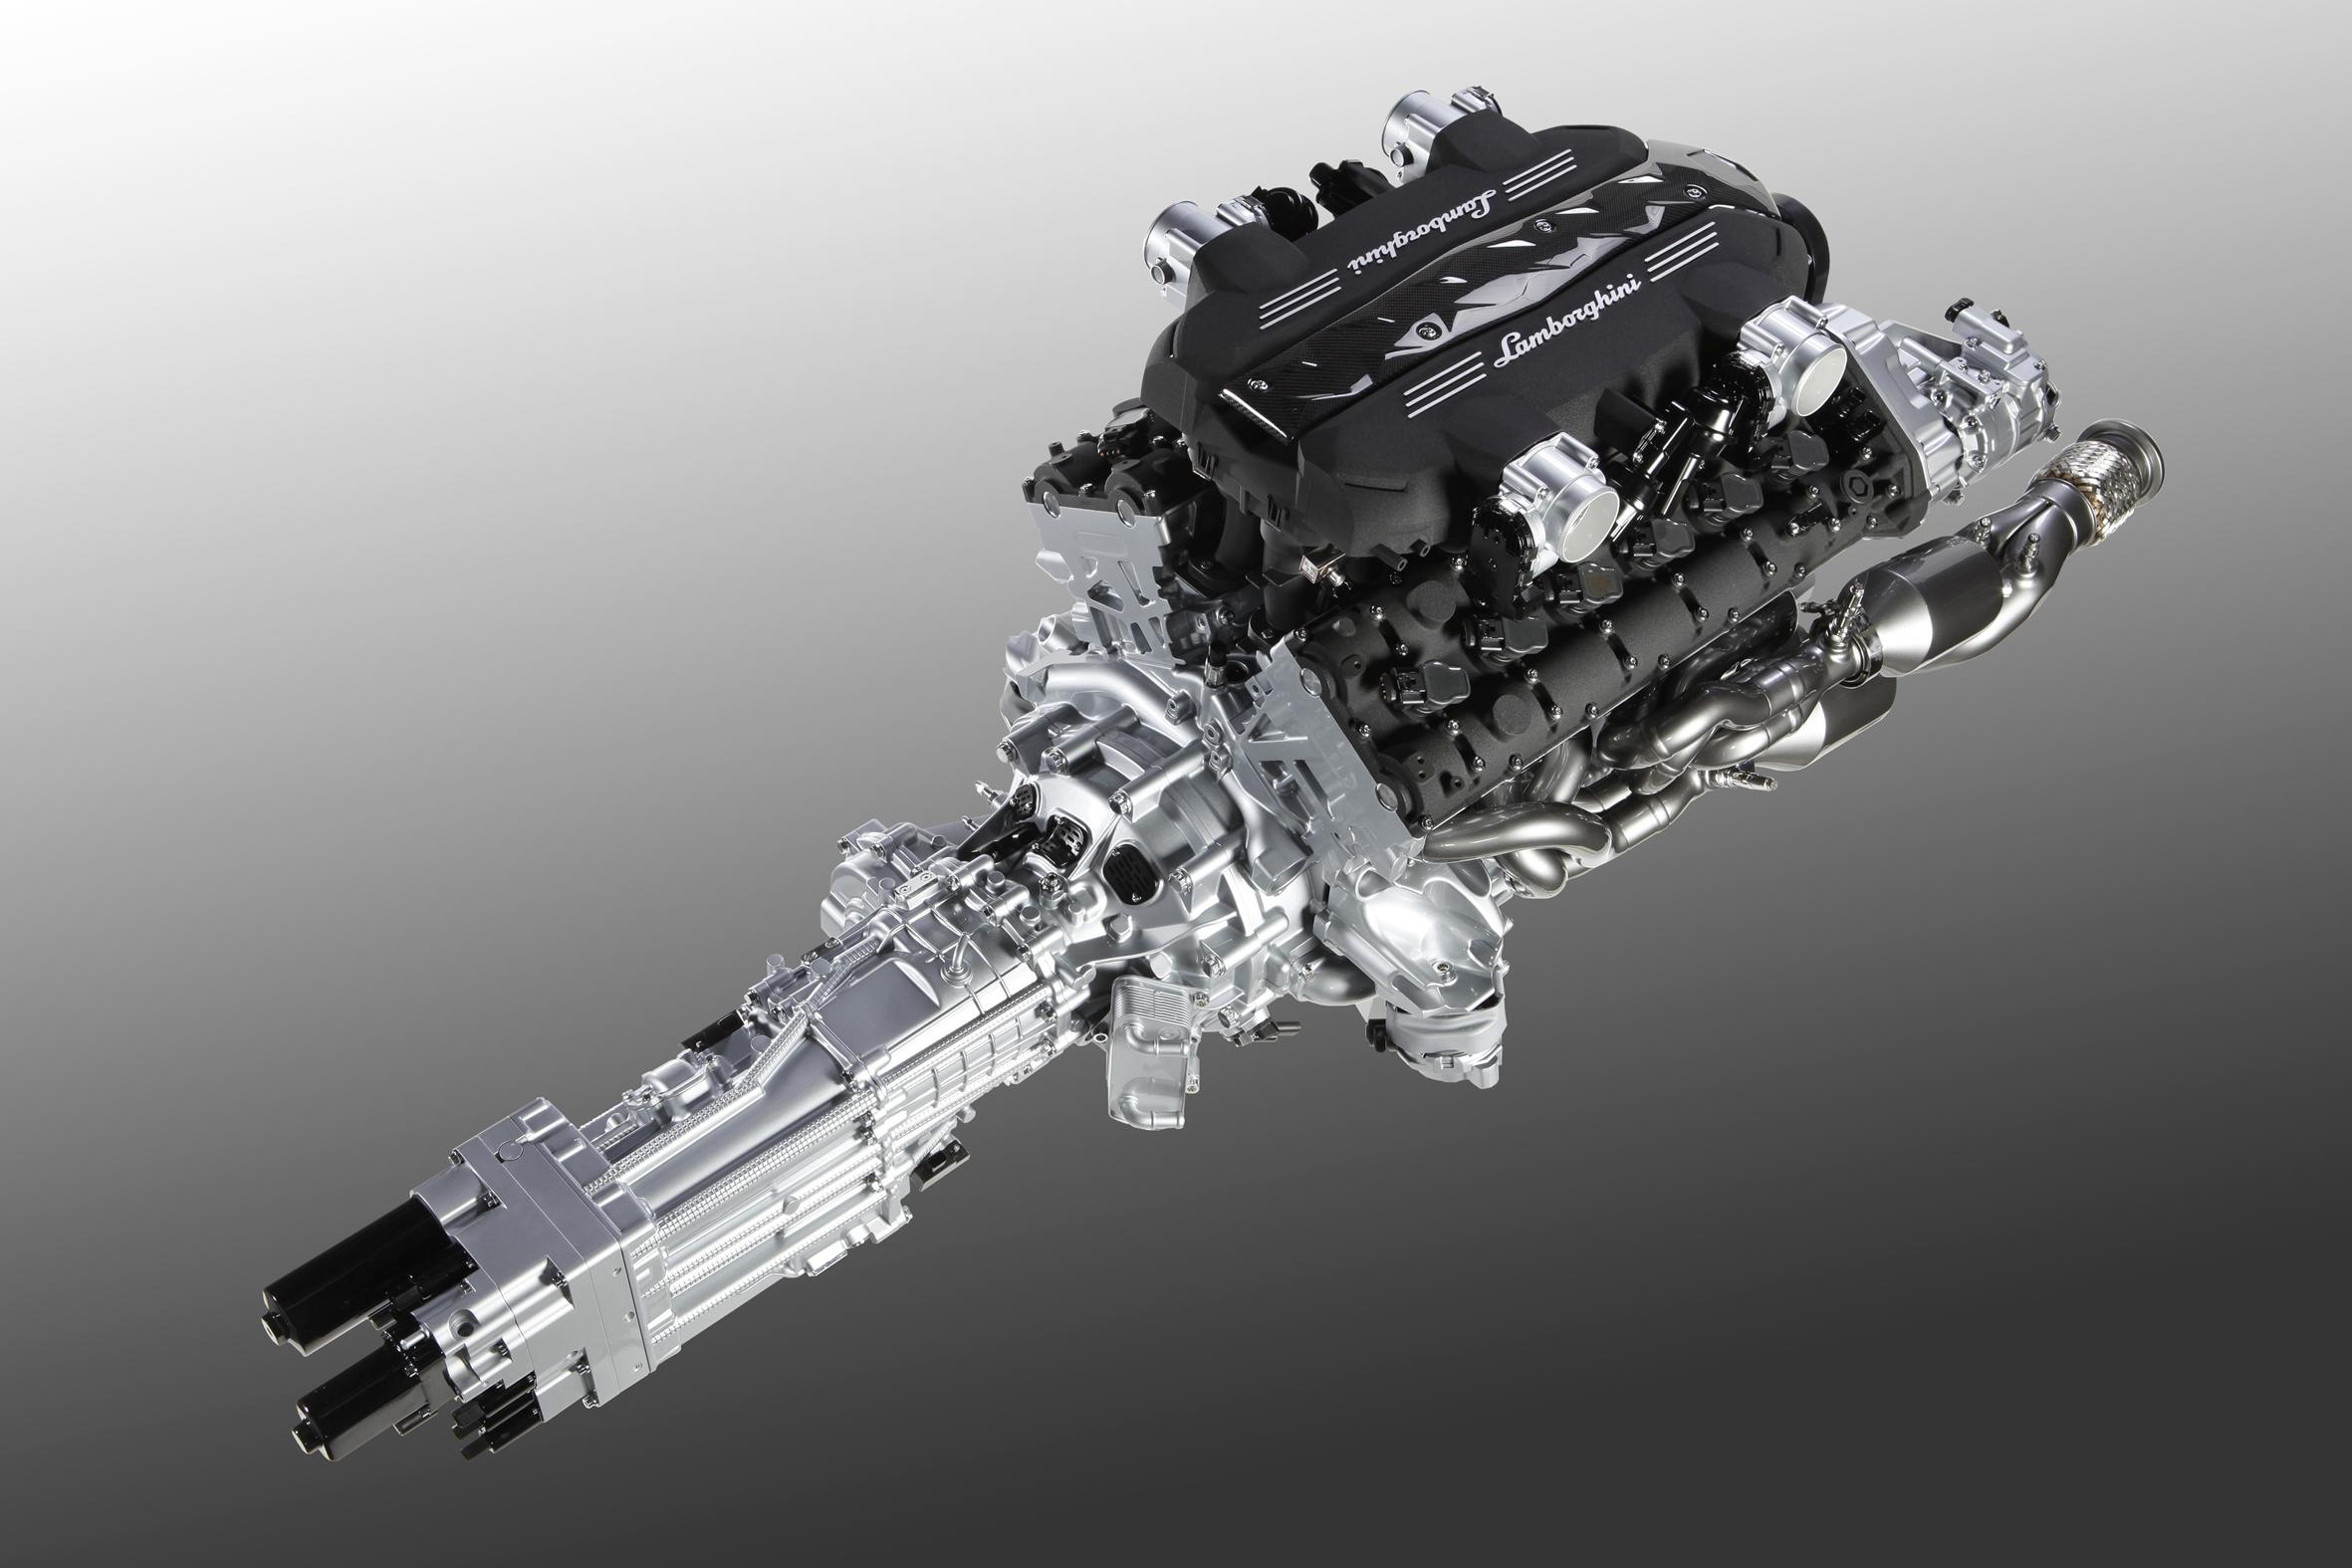 Lamborghini Aventador - V12 - engine - gearbox